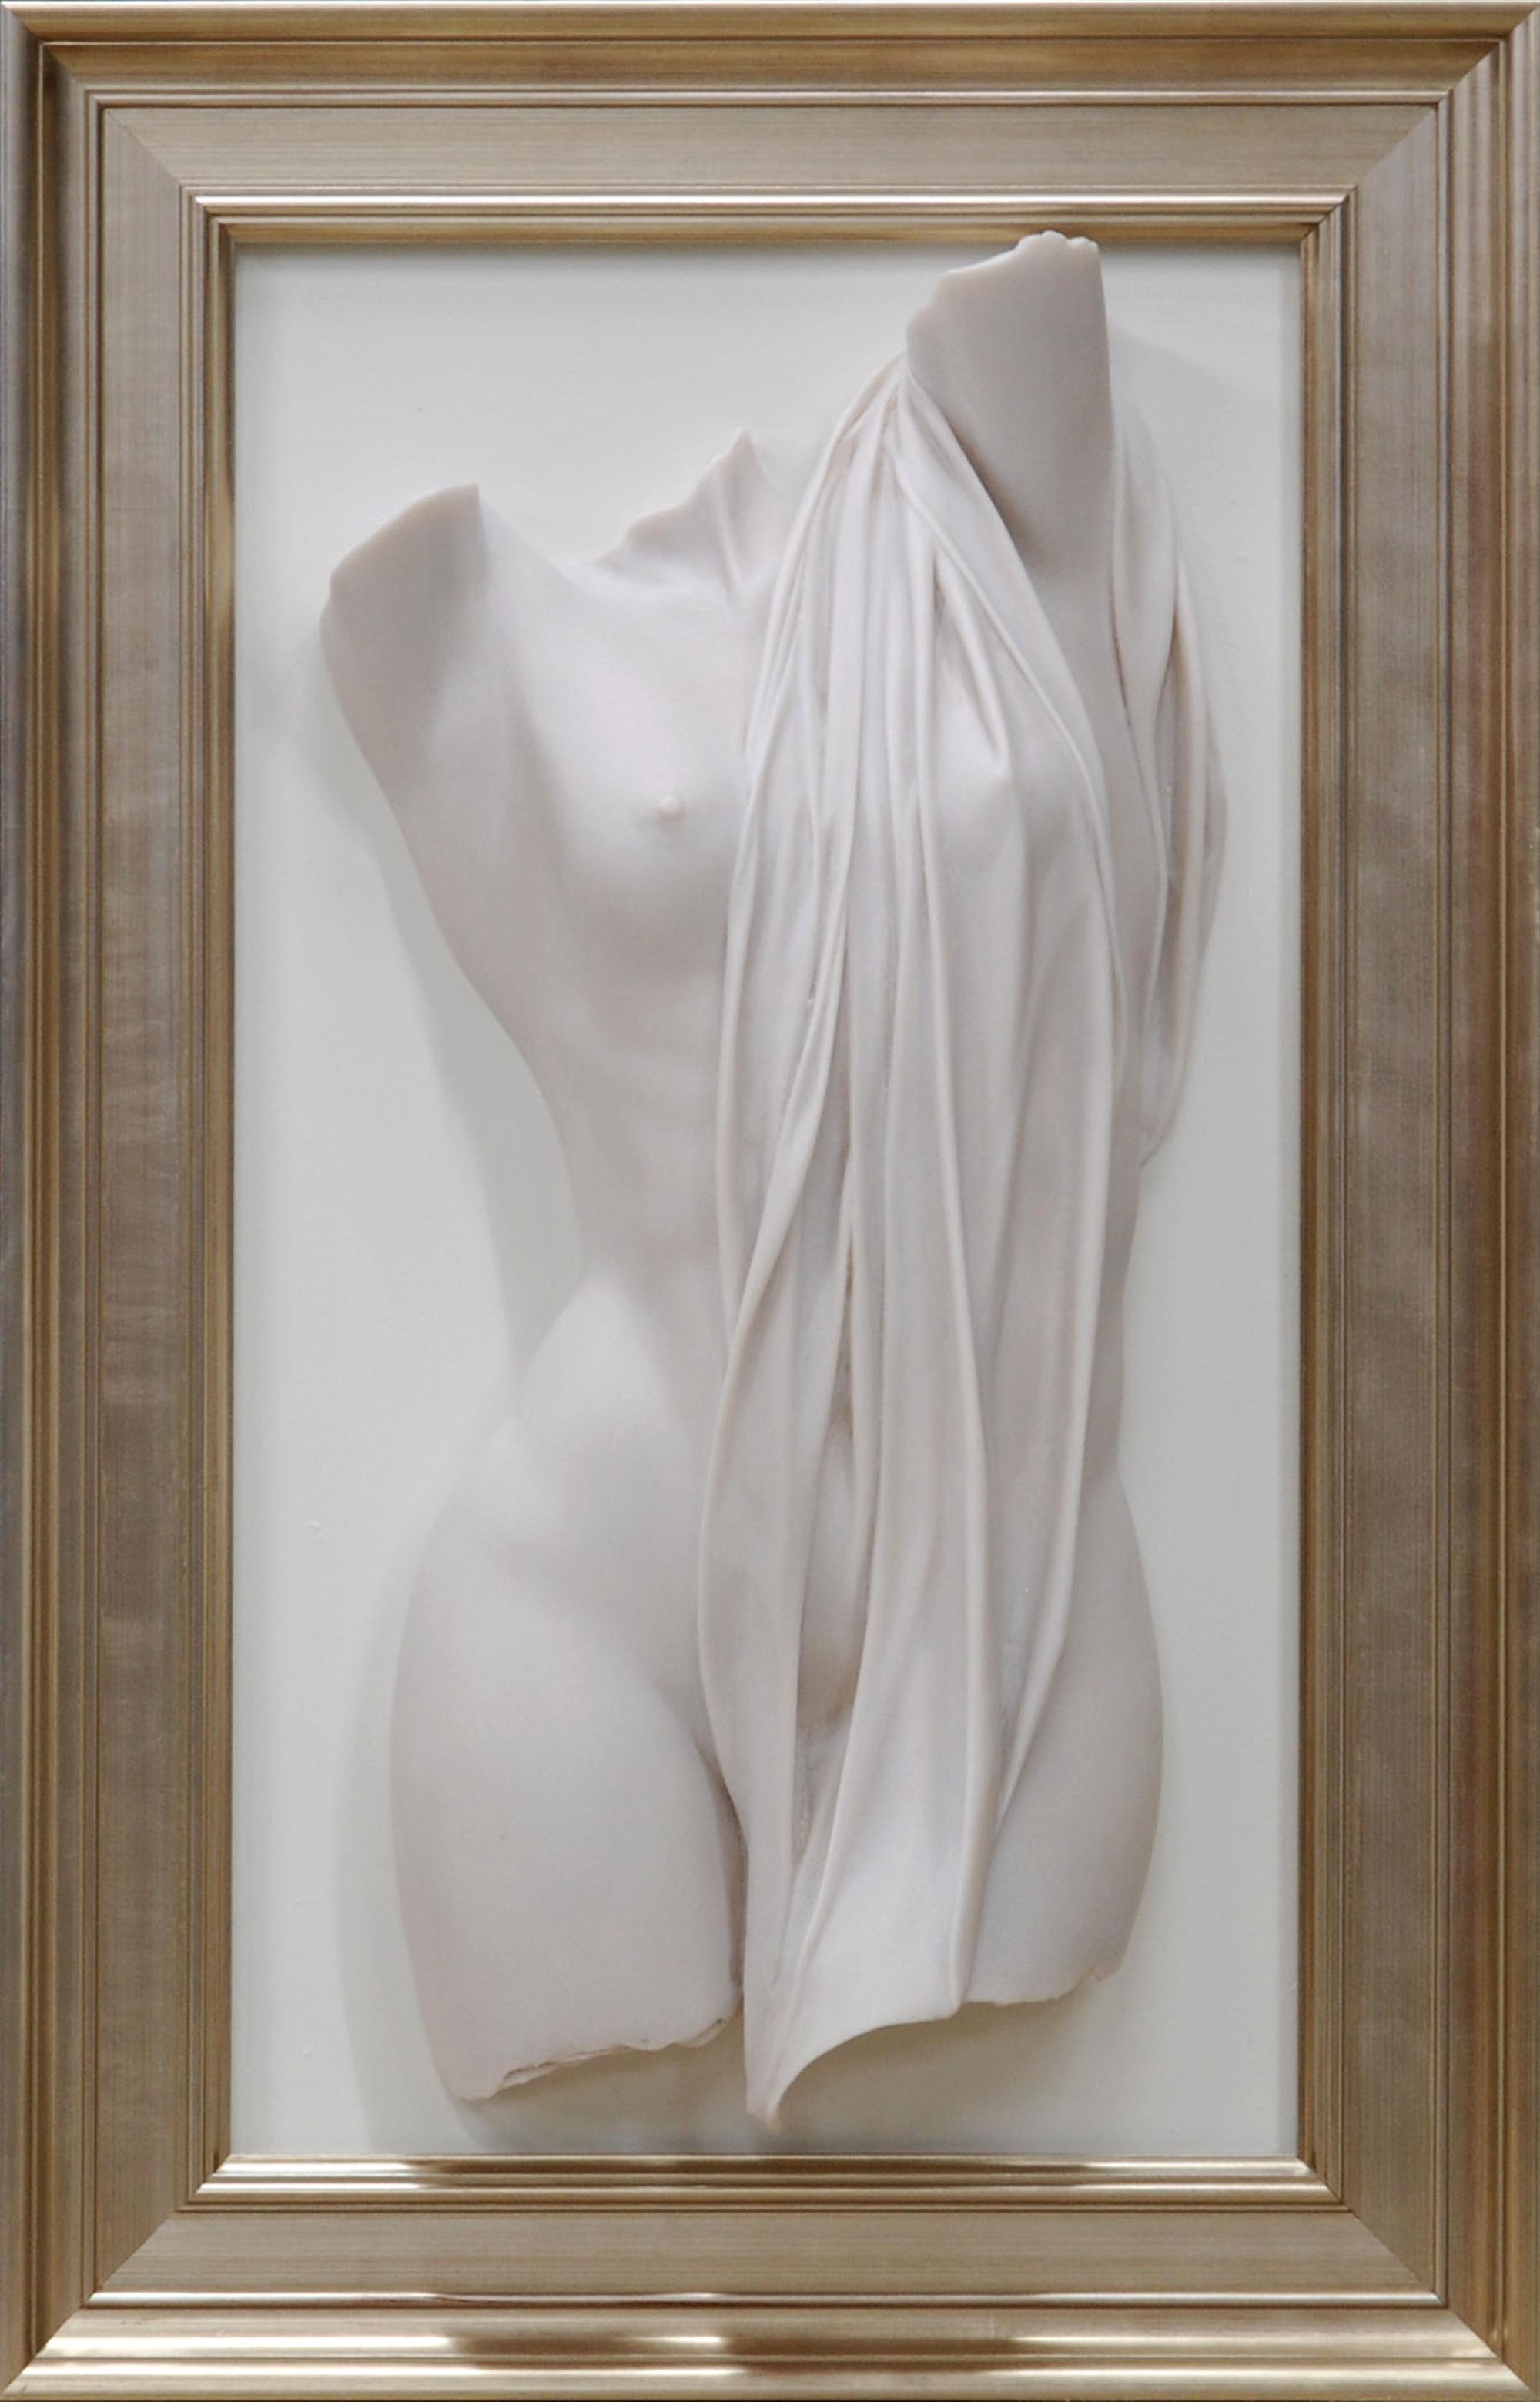 Bather Torso by Bill Mack